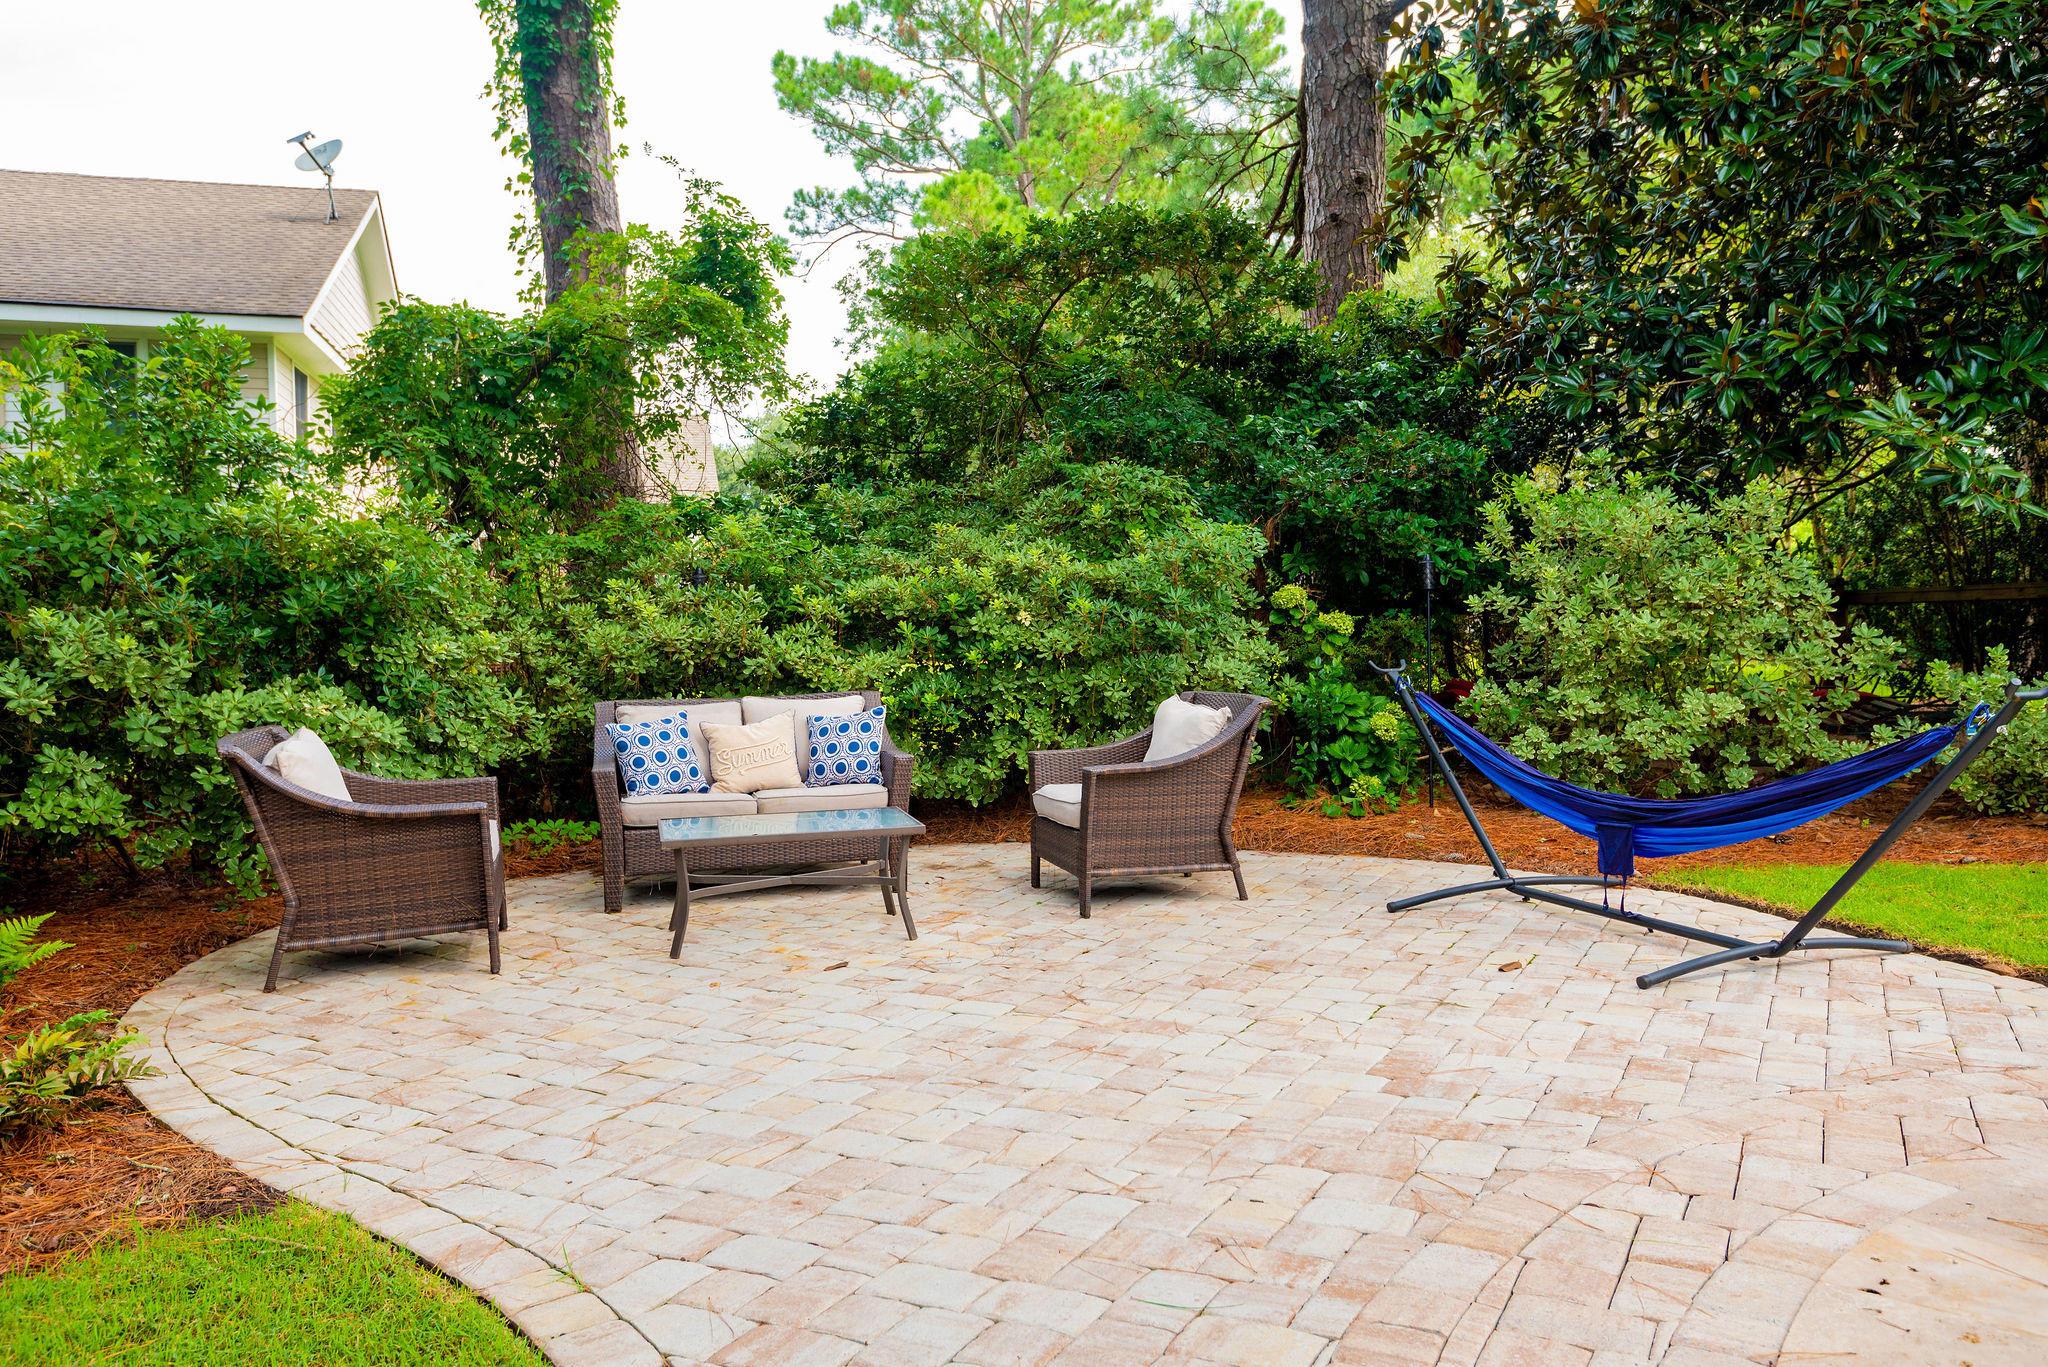 Country Club II Homes For Sale - 1482 Burningtree, Charleston, SC - 10